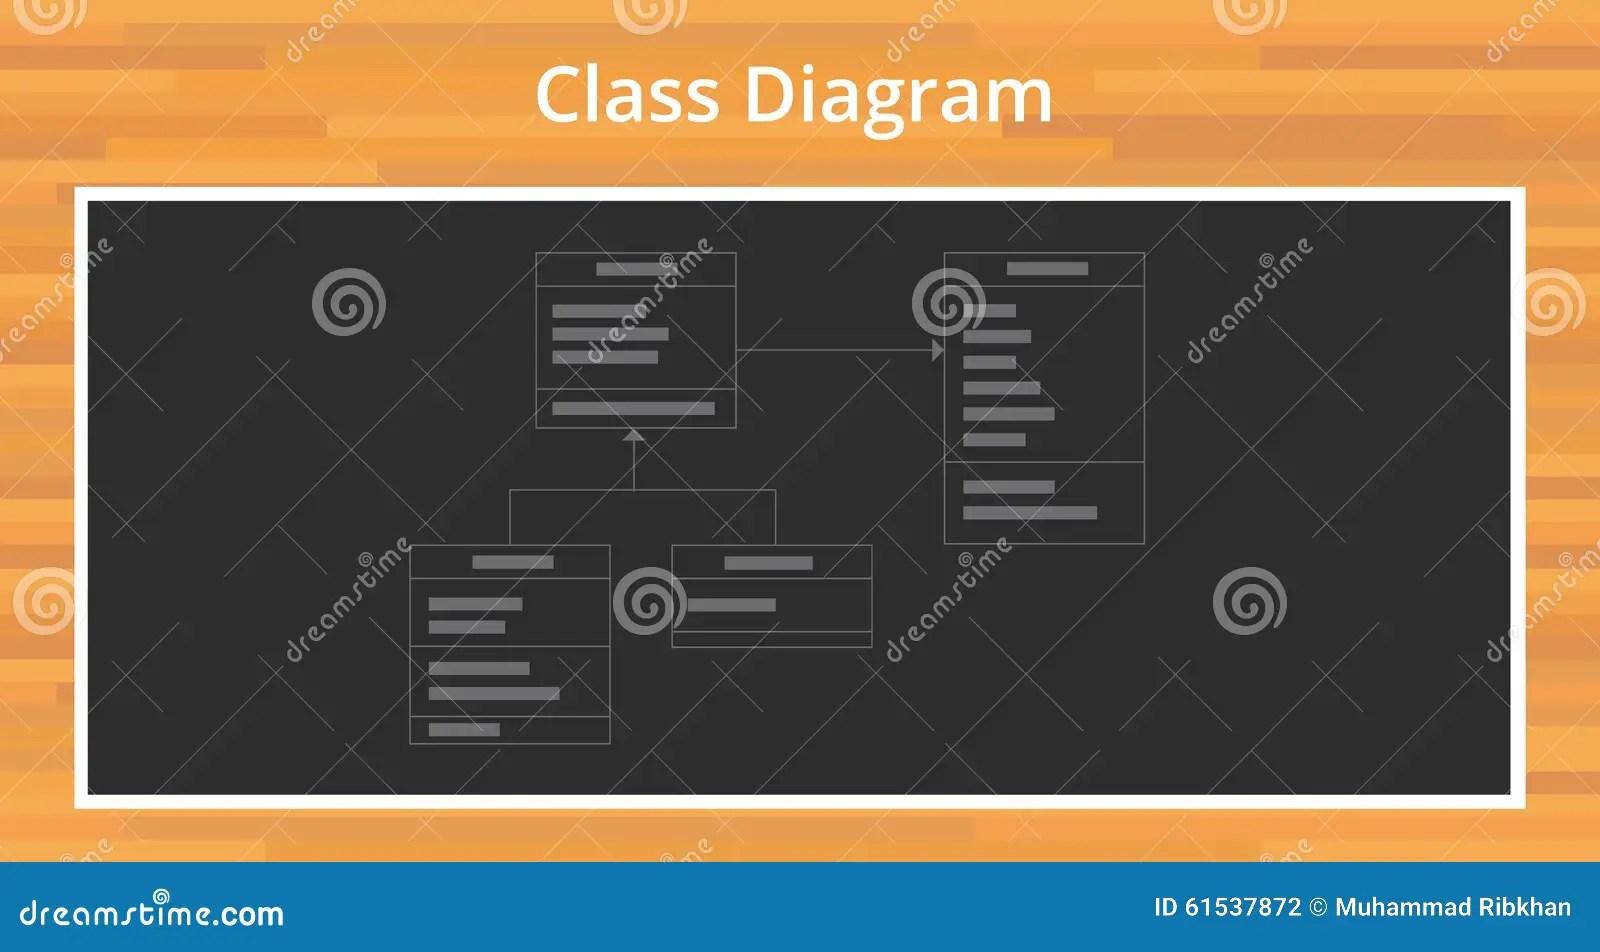 unified modeling language class diagram 2007 kenworth radio wiring uml modelling stock vector